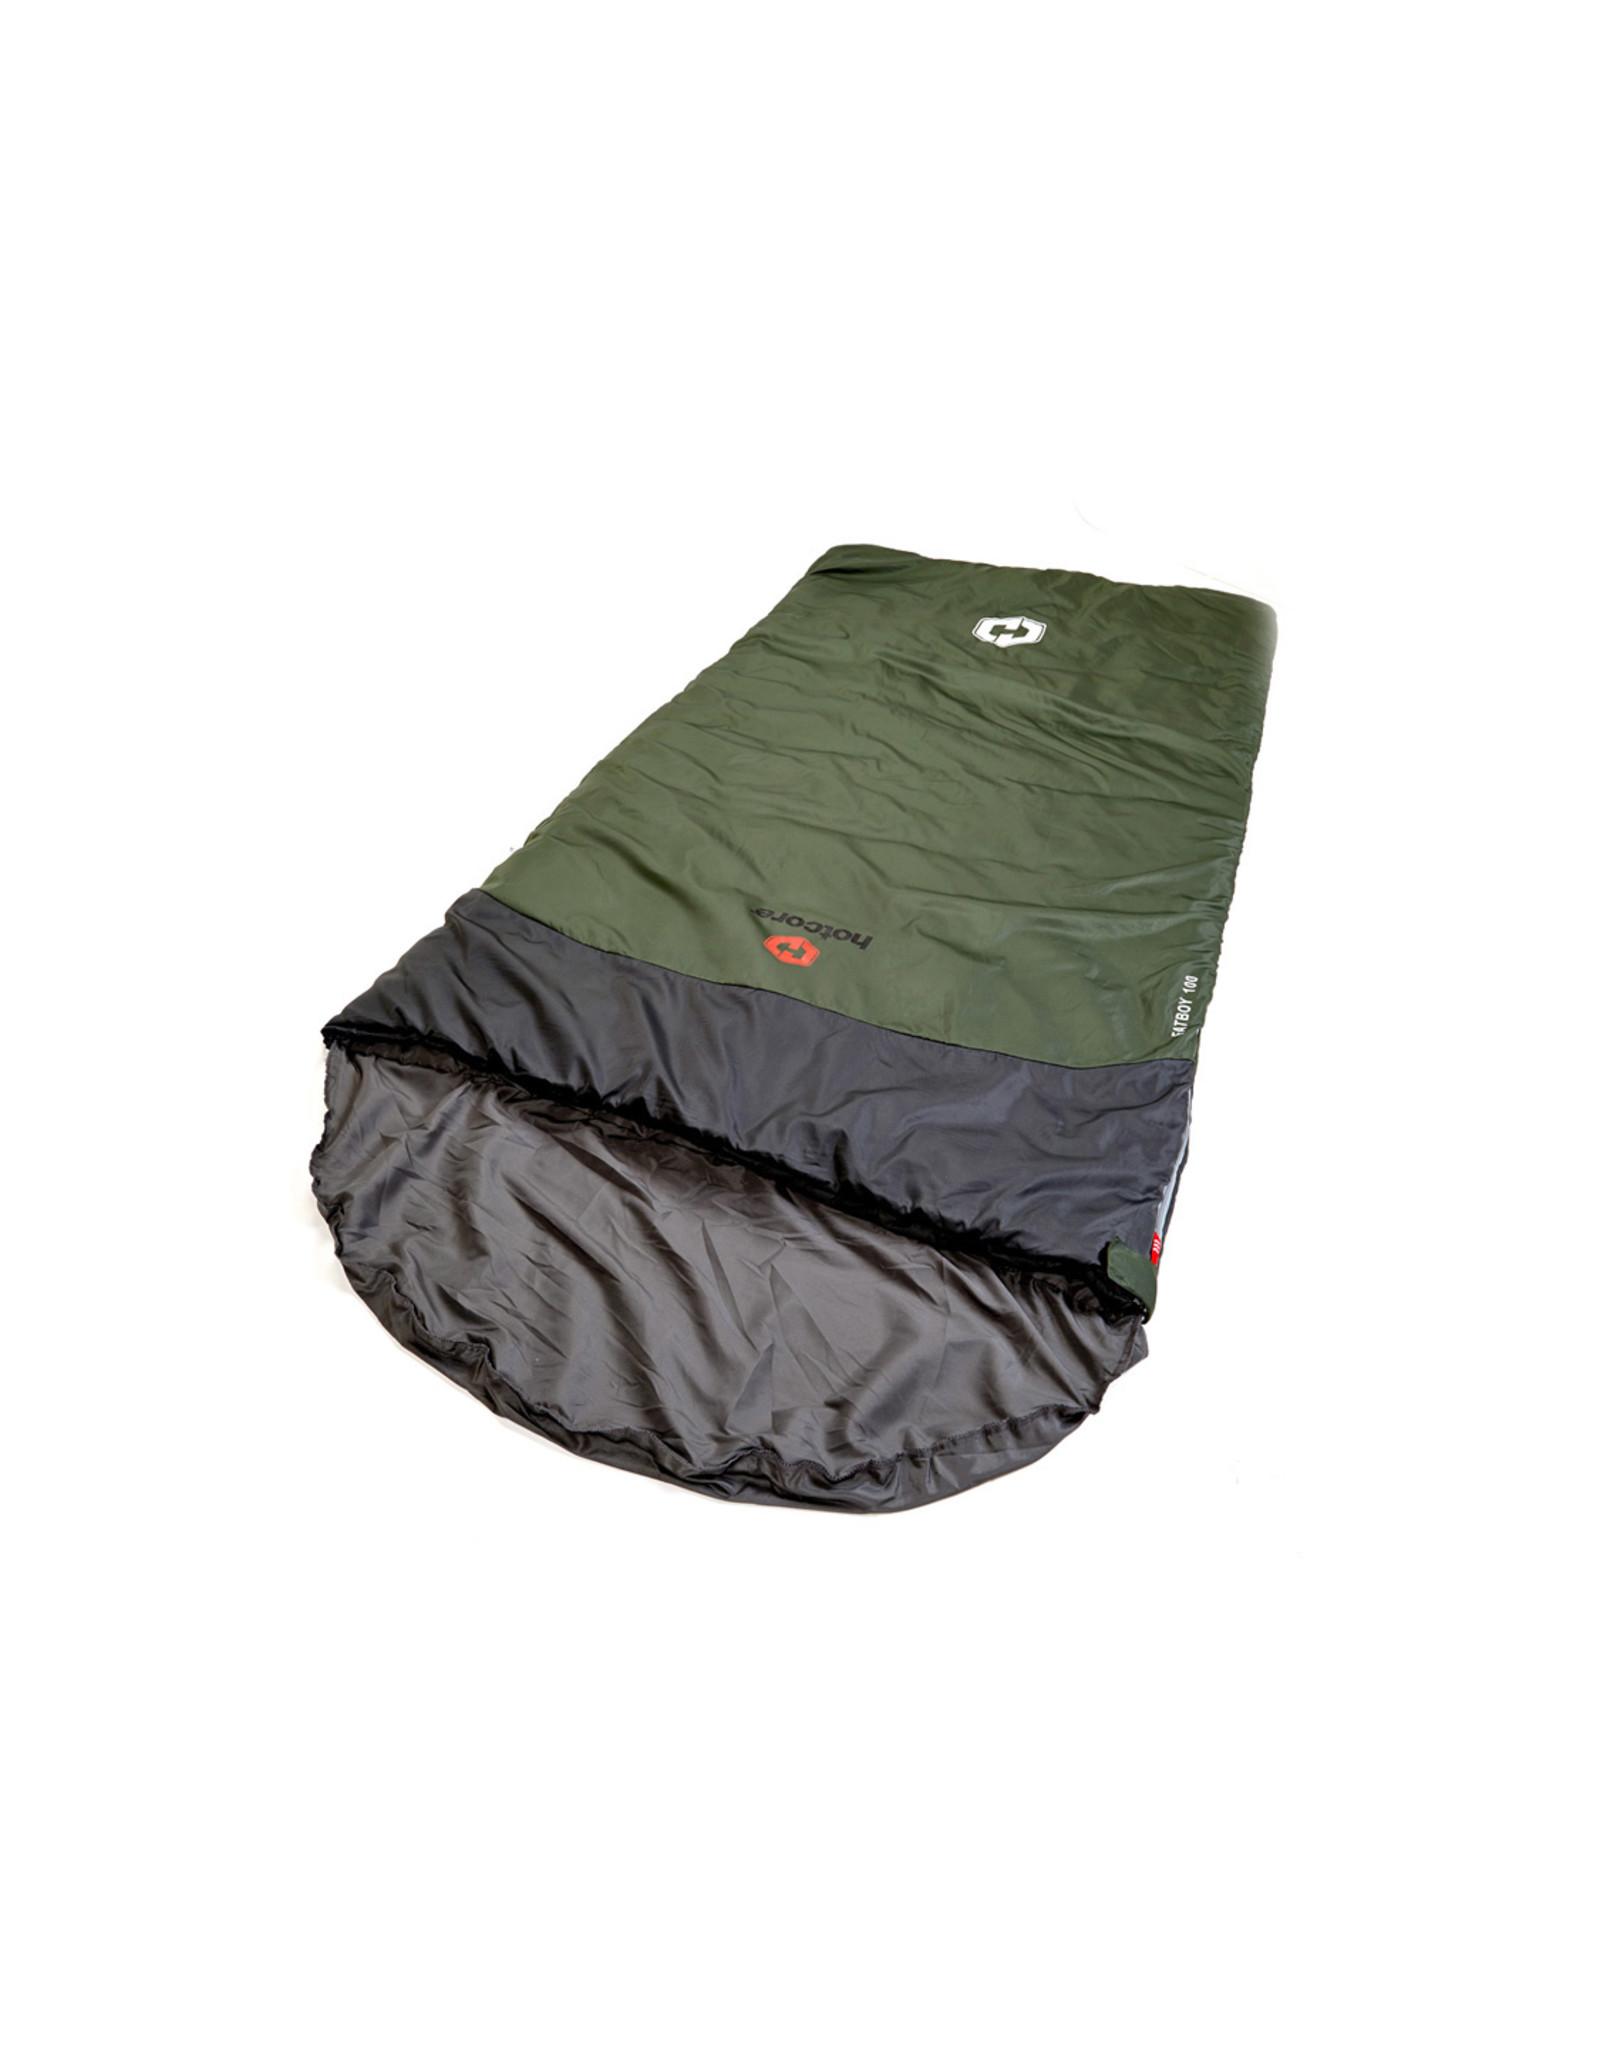 HOTCORE HOTCORE- FATBOY 100- OVERSIZED RECTANGULAR SLEEPING BAG, GREEN- 0C/32F